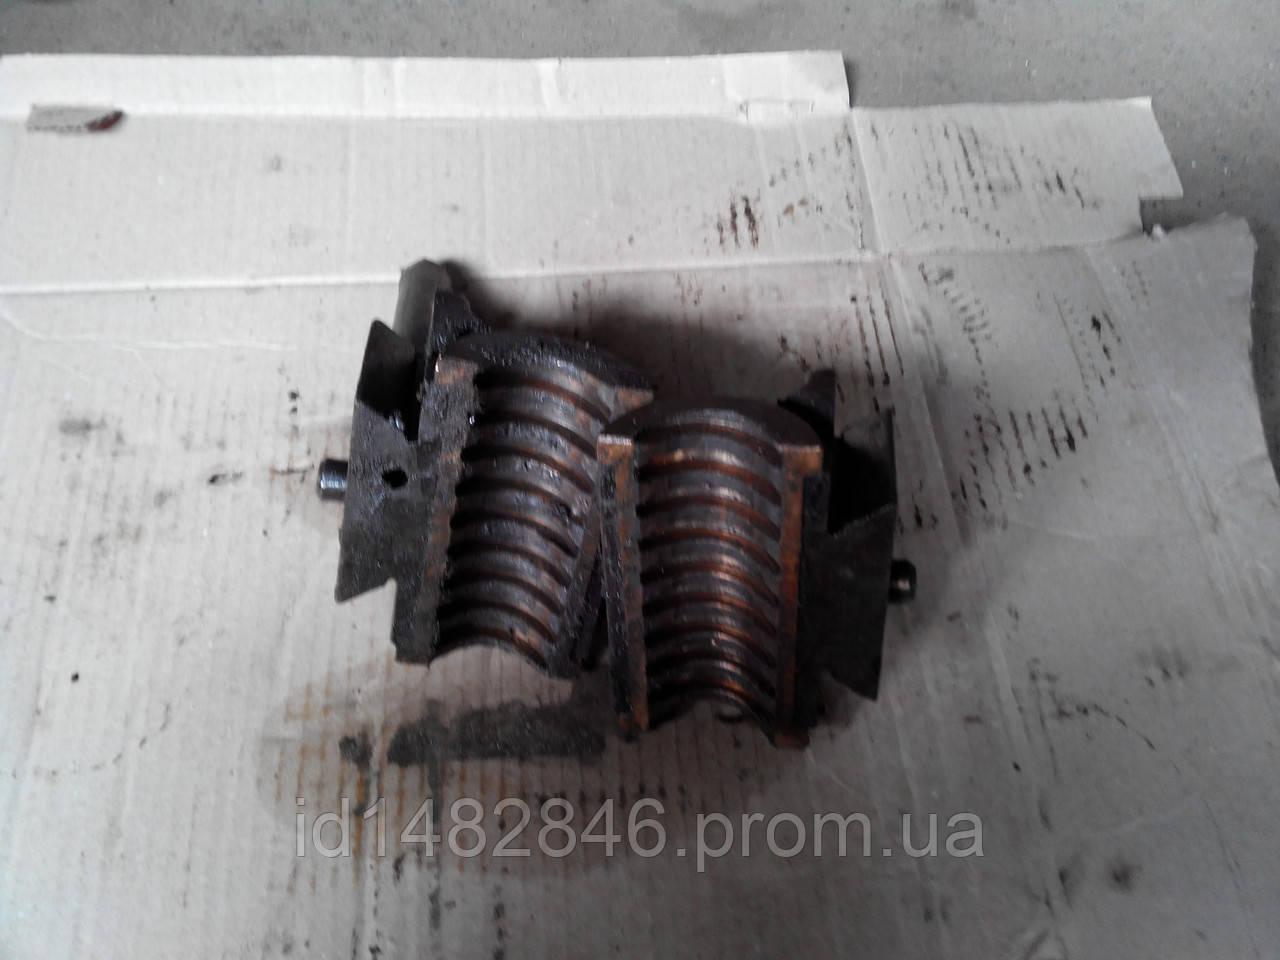 Маточная гайка токарного станка 1А62